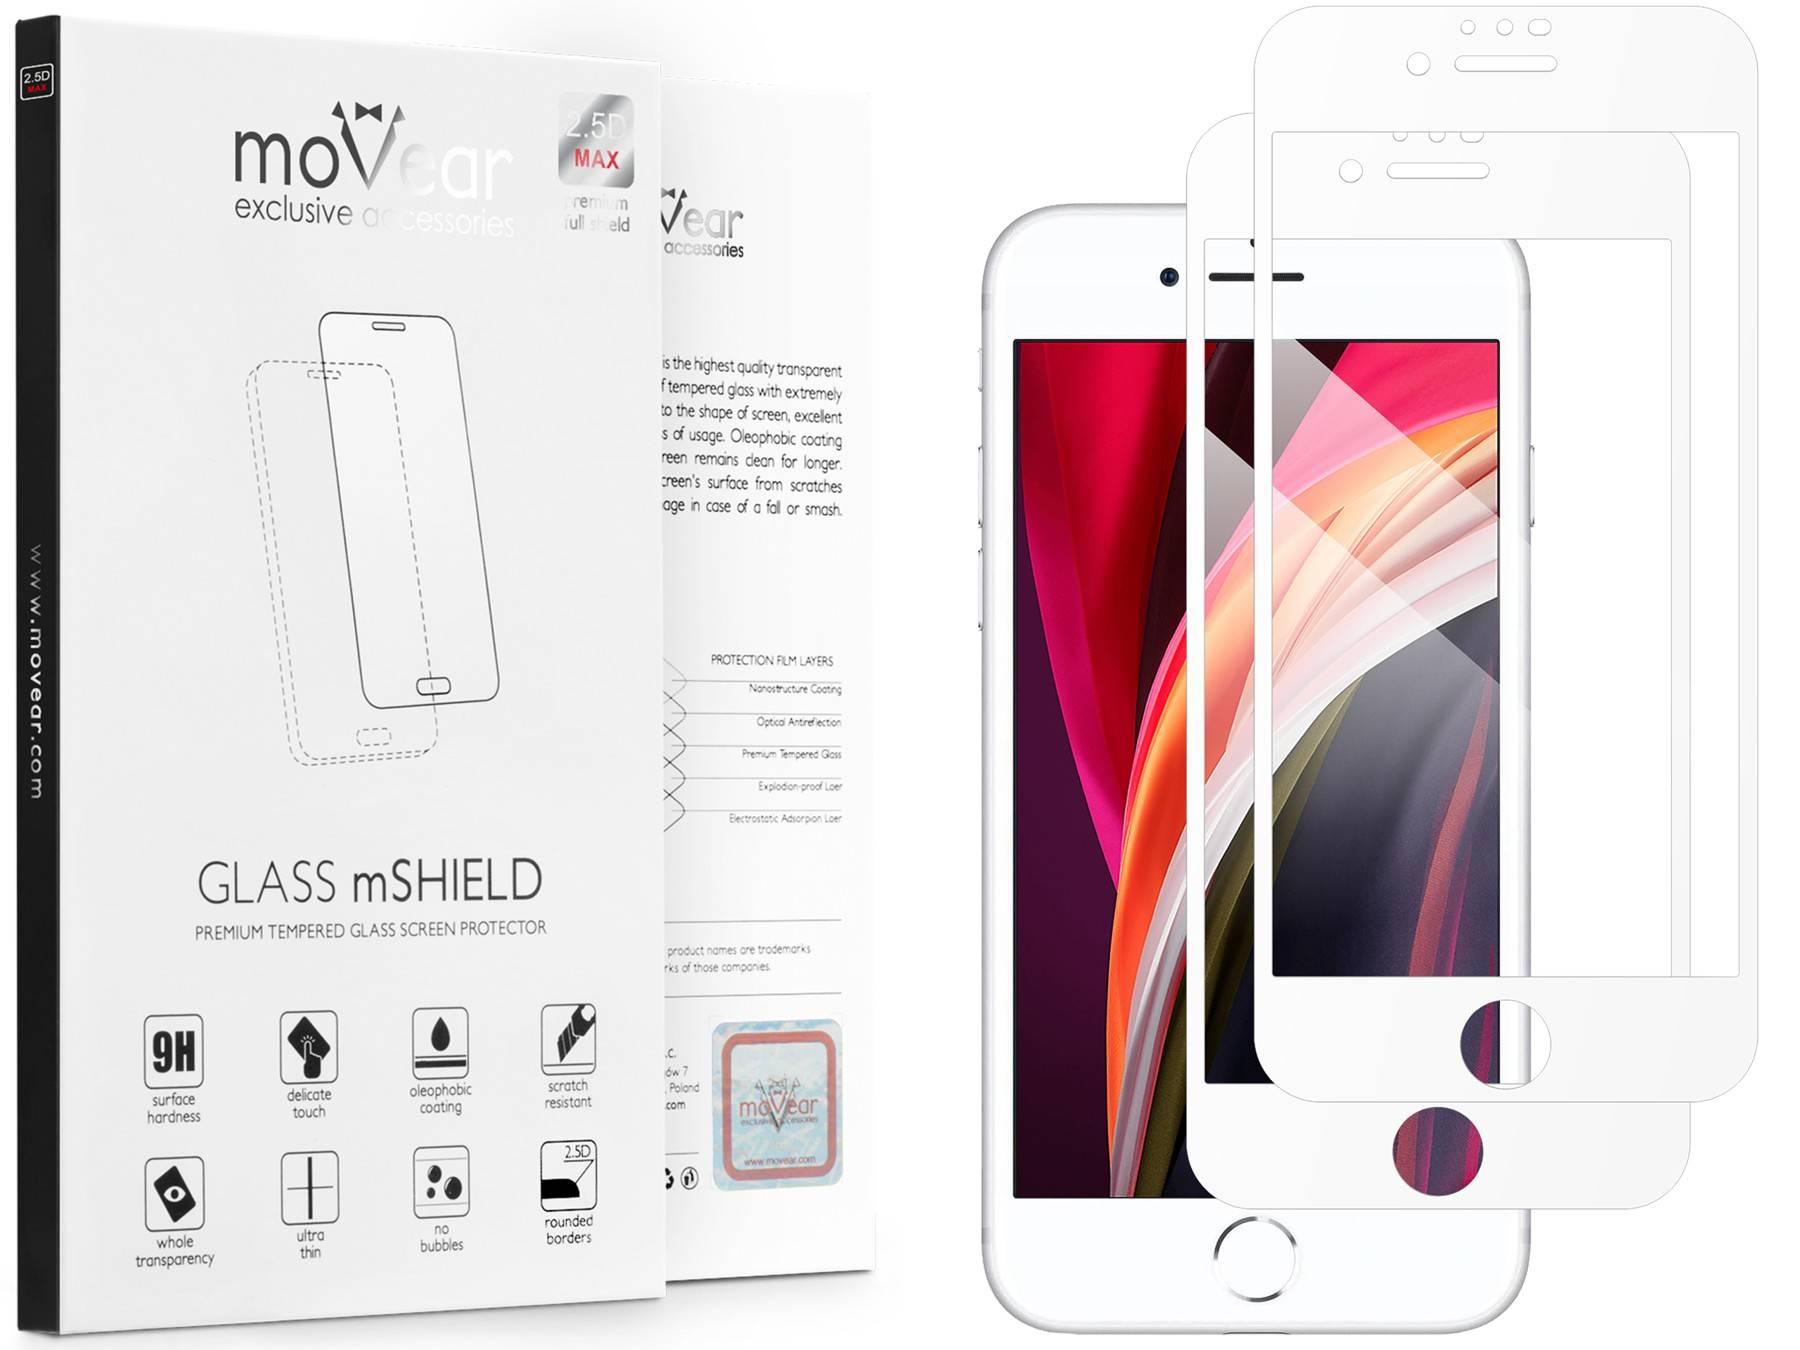 2 szt.   moVear Szkło Hartowane 2.5D MAX na Apple iPhone 8 / 7   do etui, 9H   GLASS mSHIELD Biały